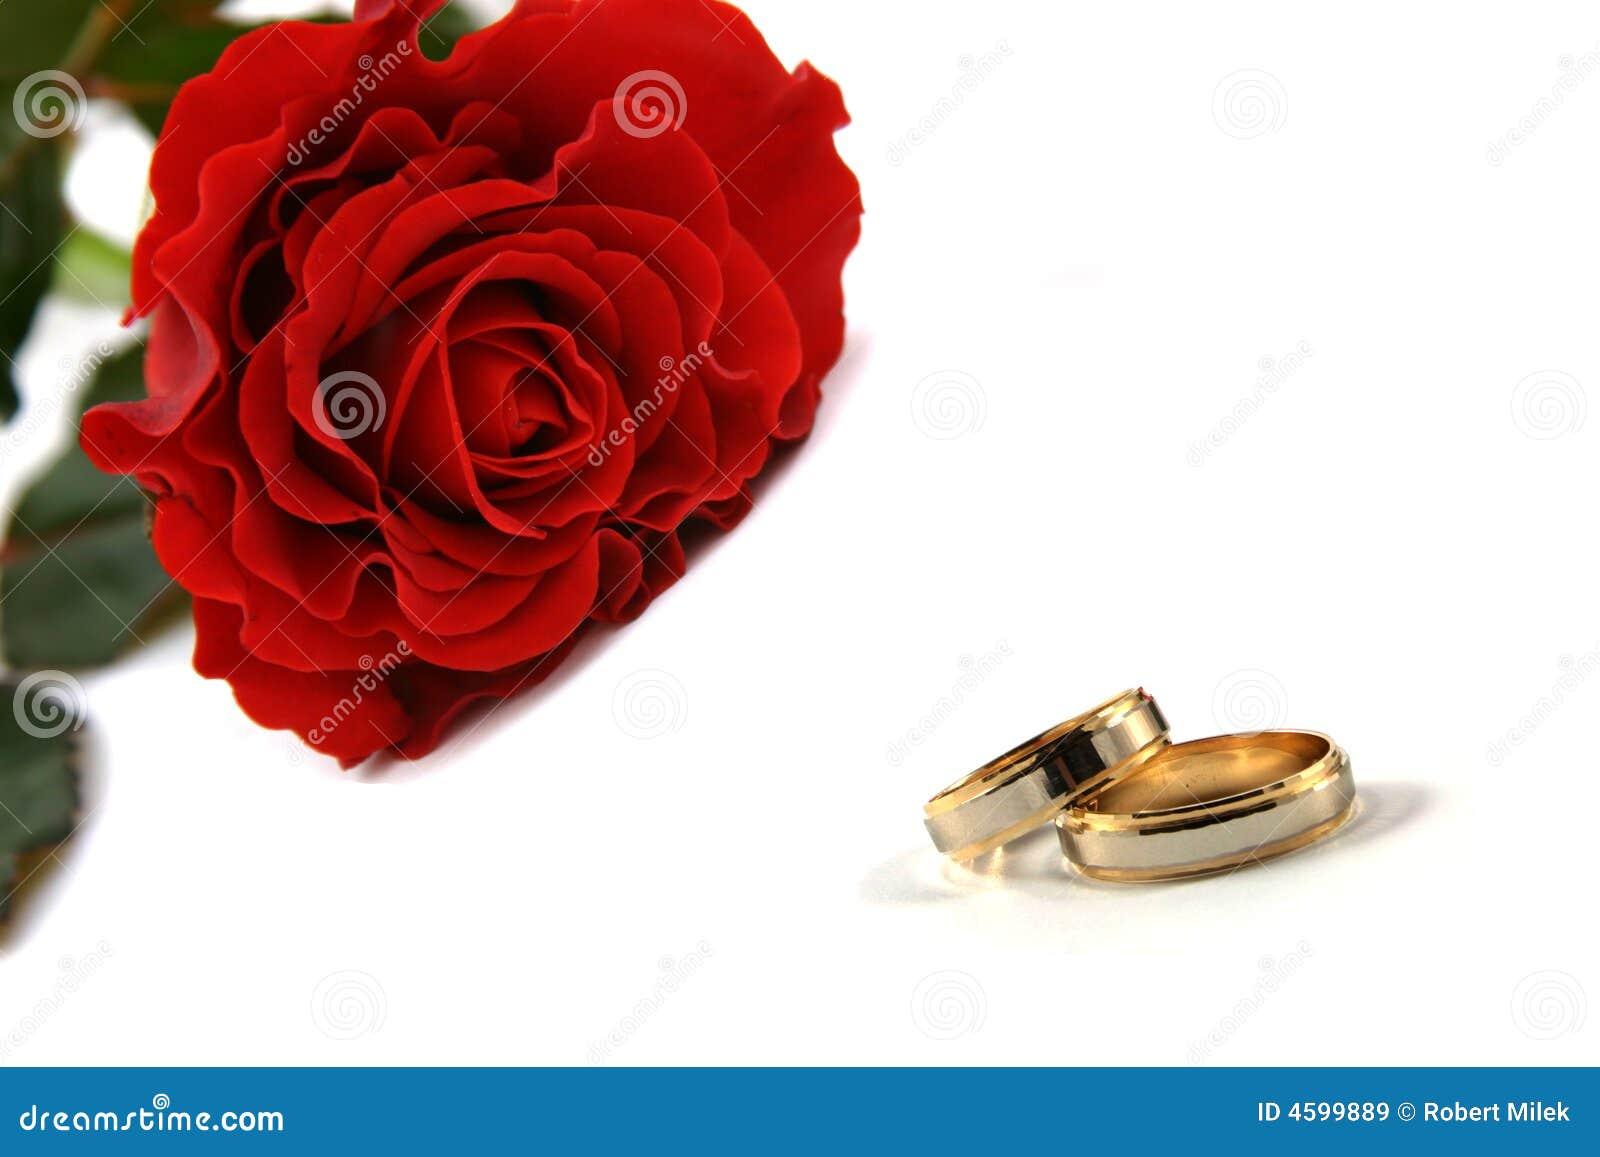 Best new wedding rings